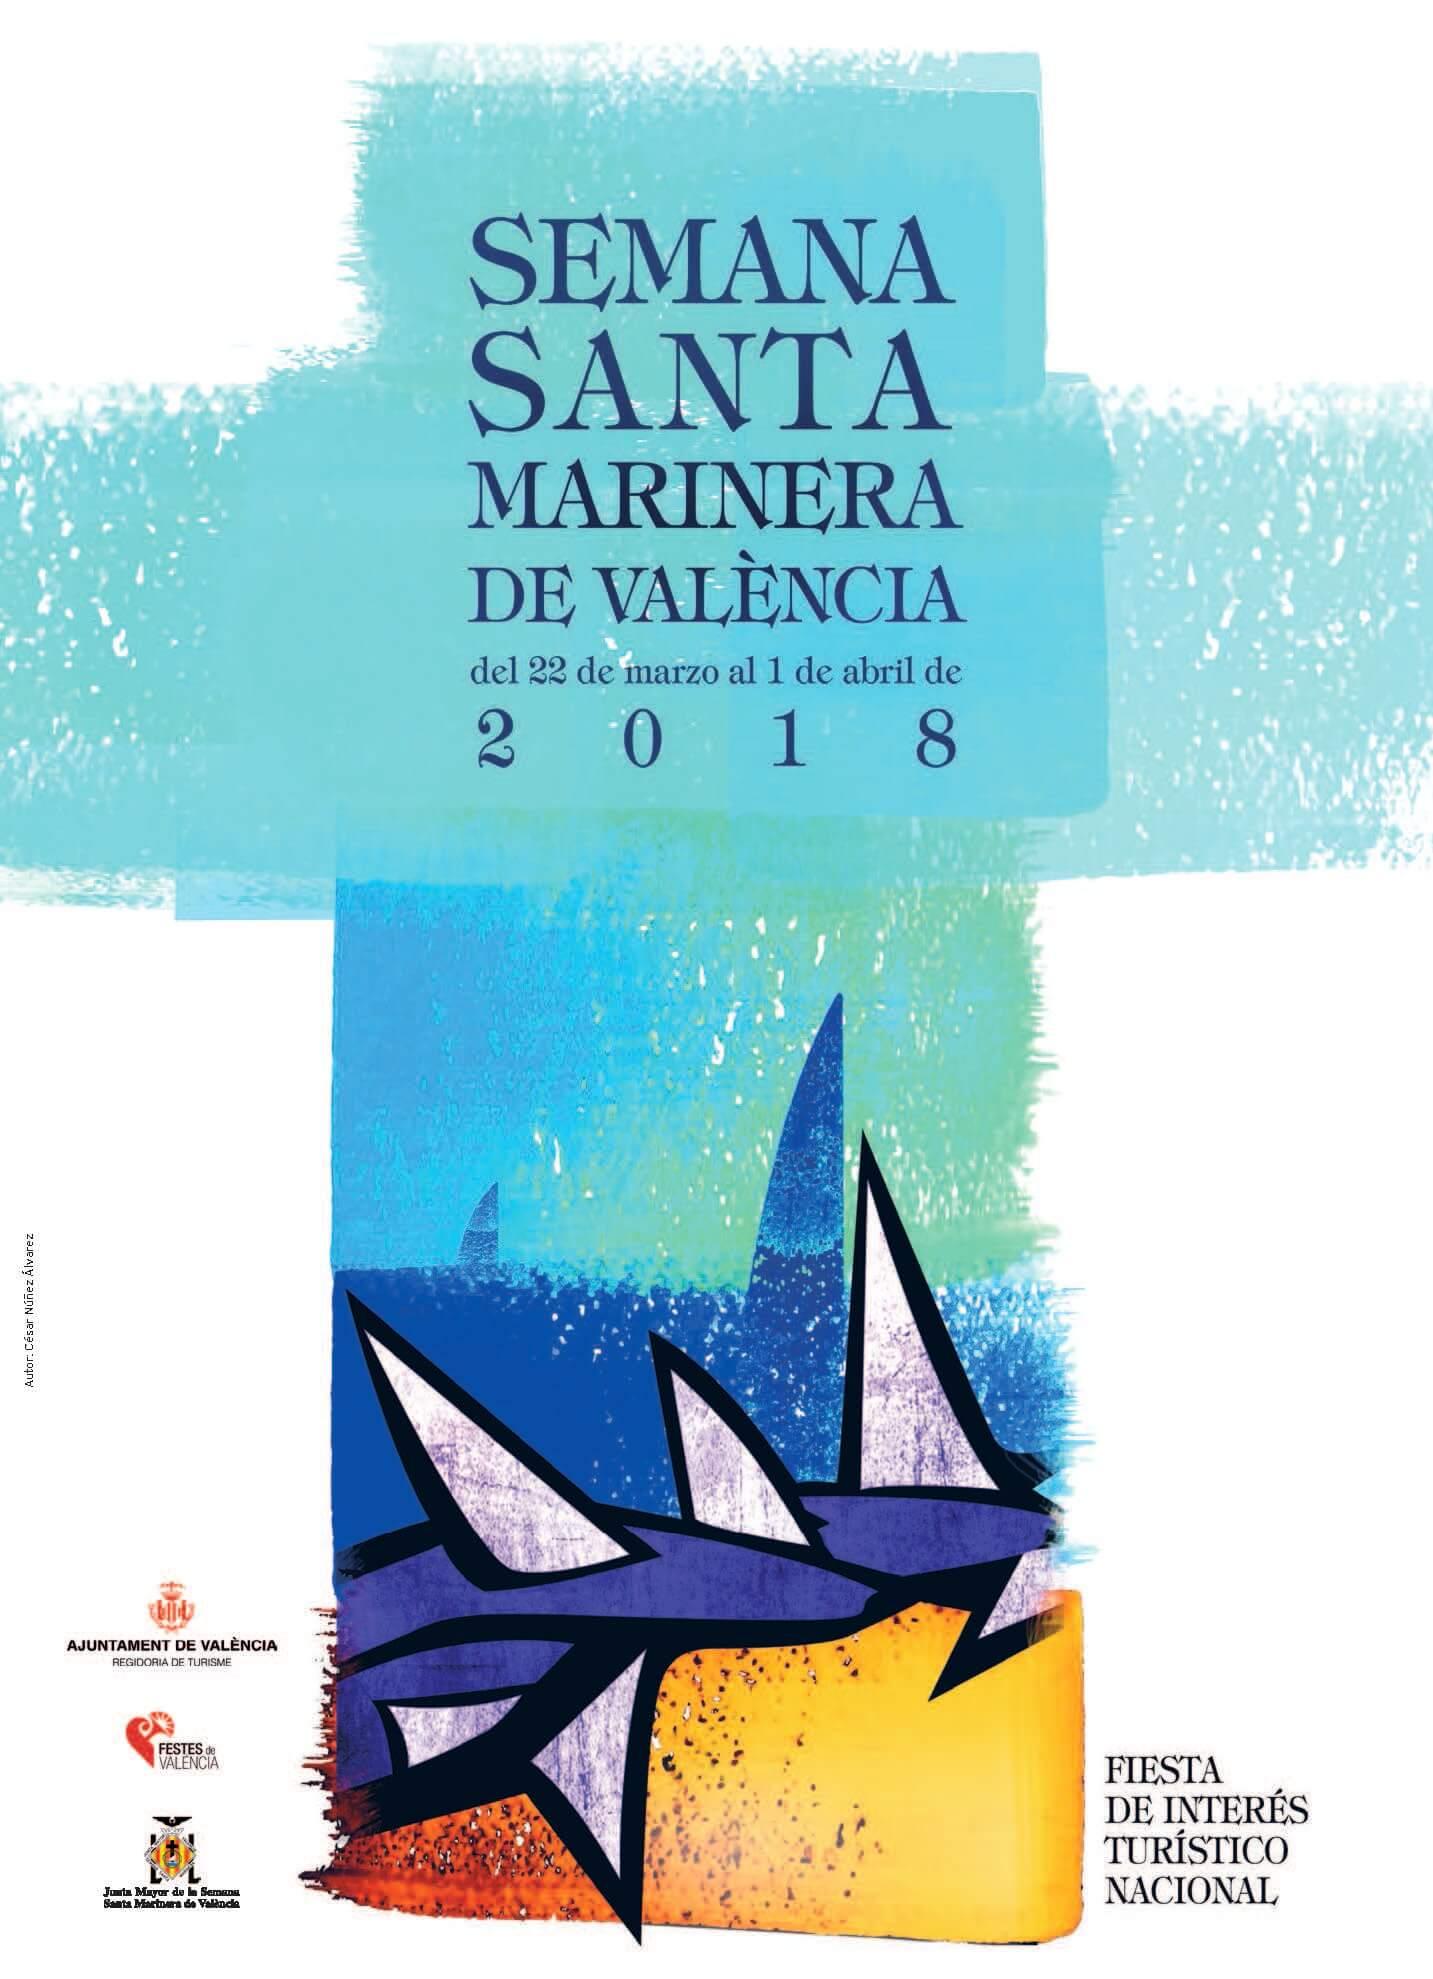 Semana Santa Marinera 2018